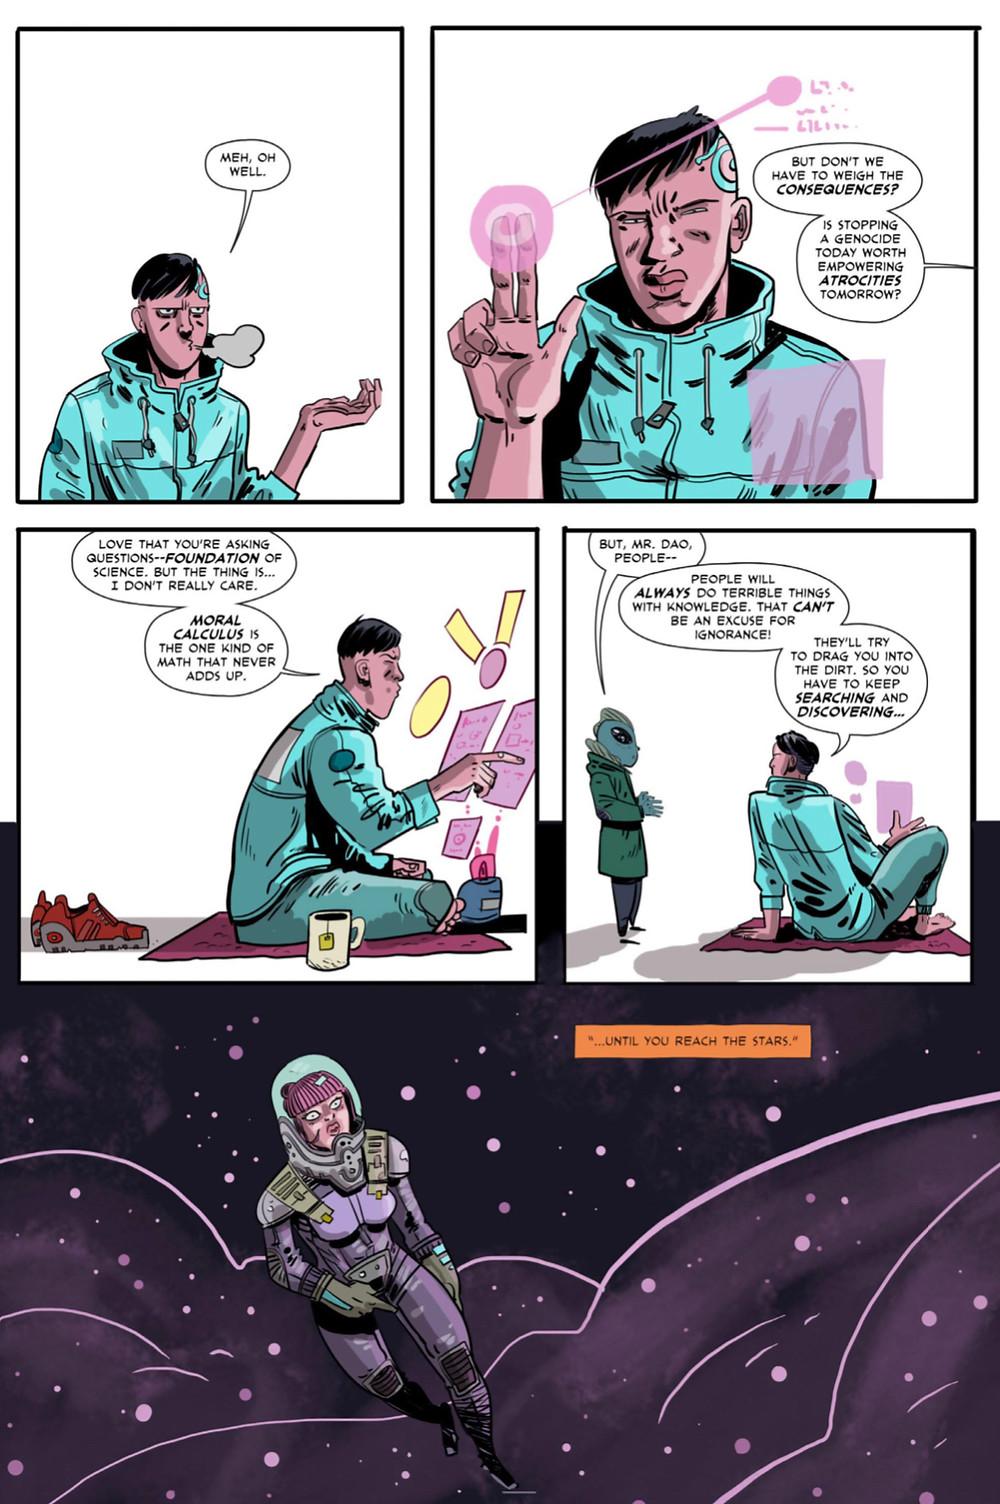 Gryffen, issue #3, page 5, SBI Press, Kahn/Hidalgo